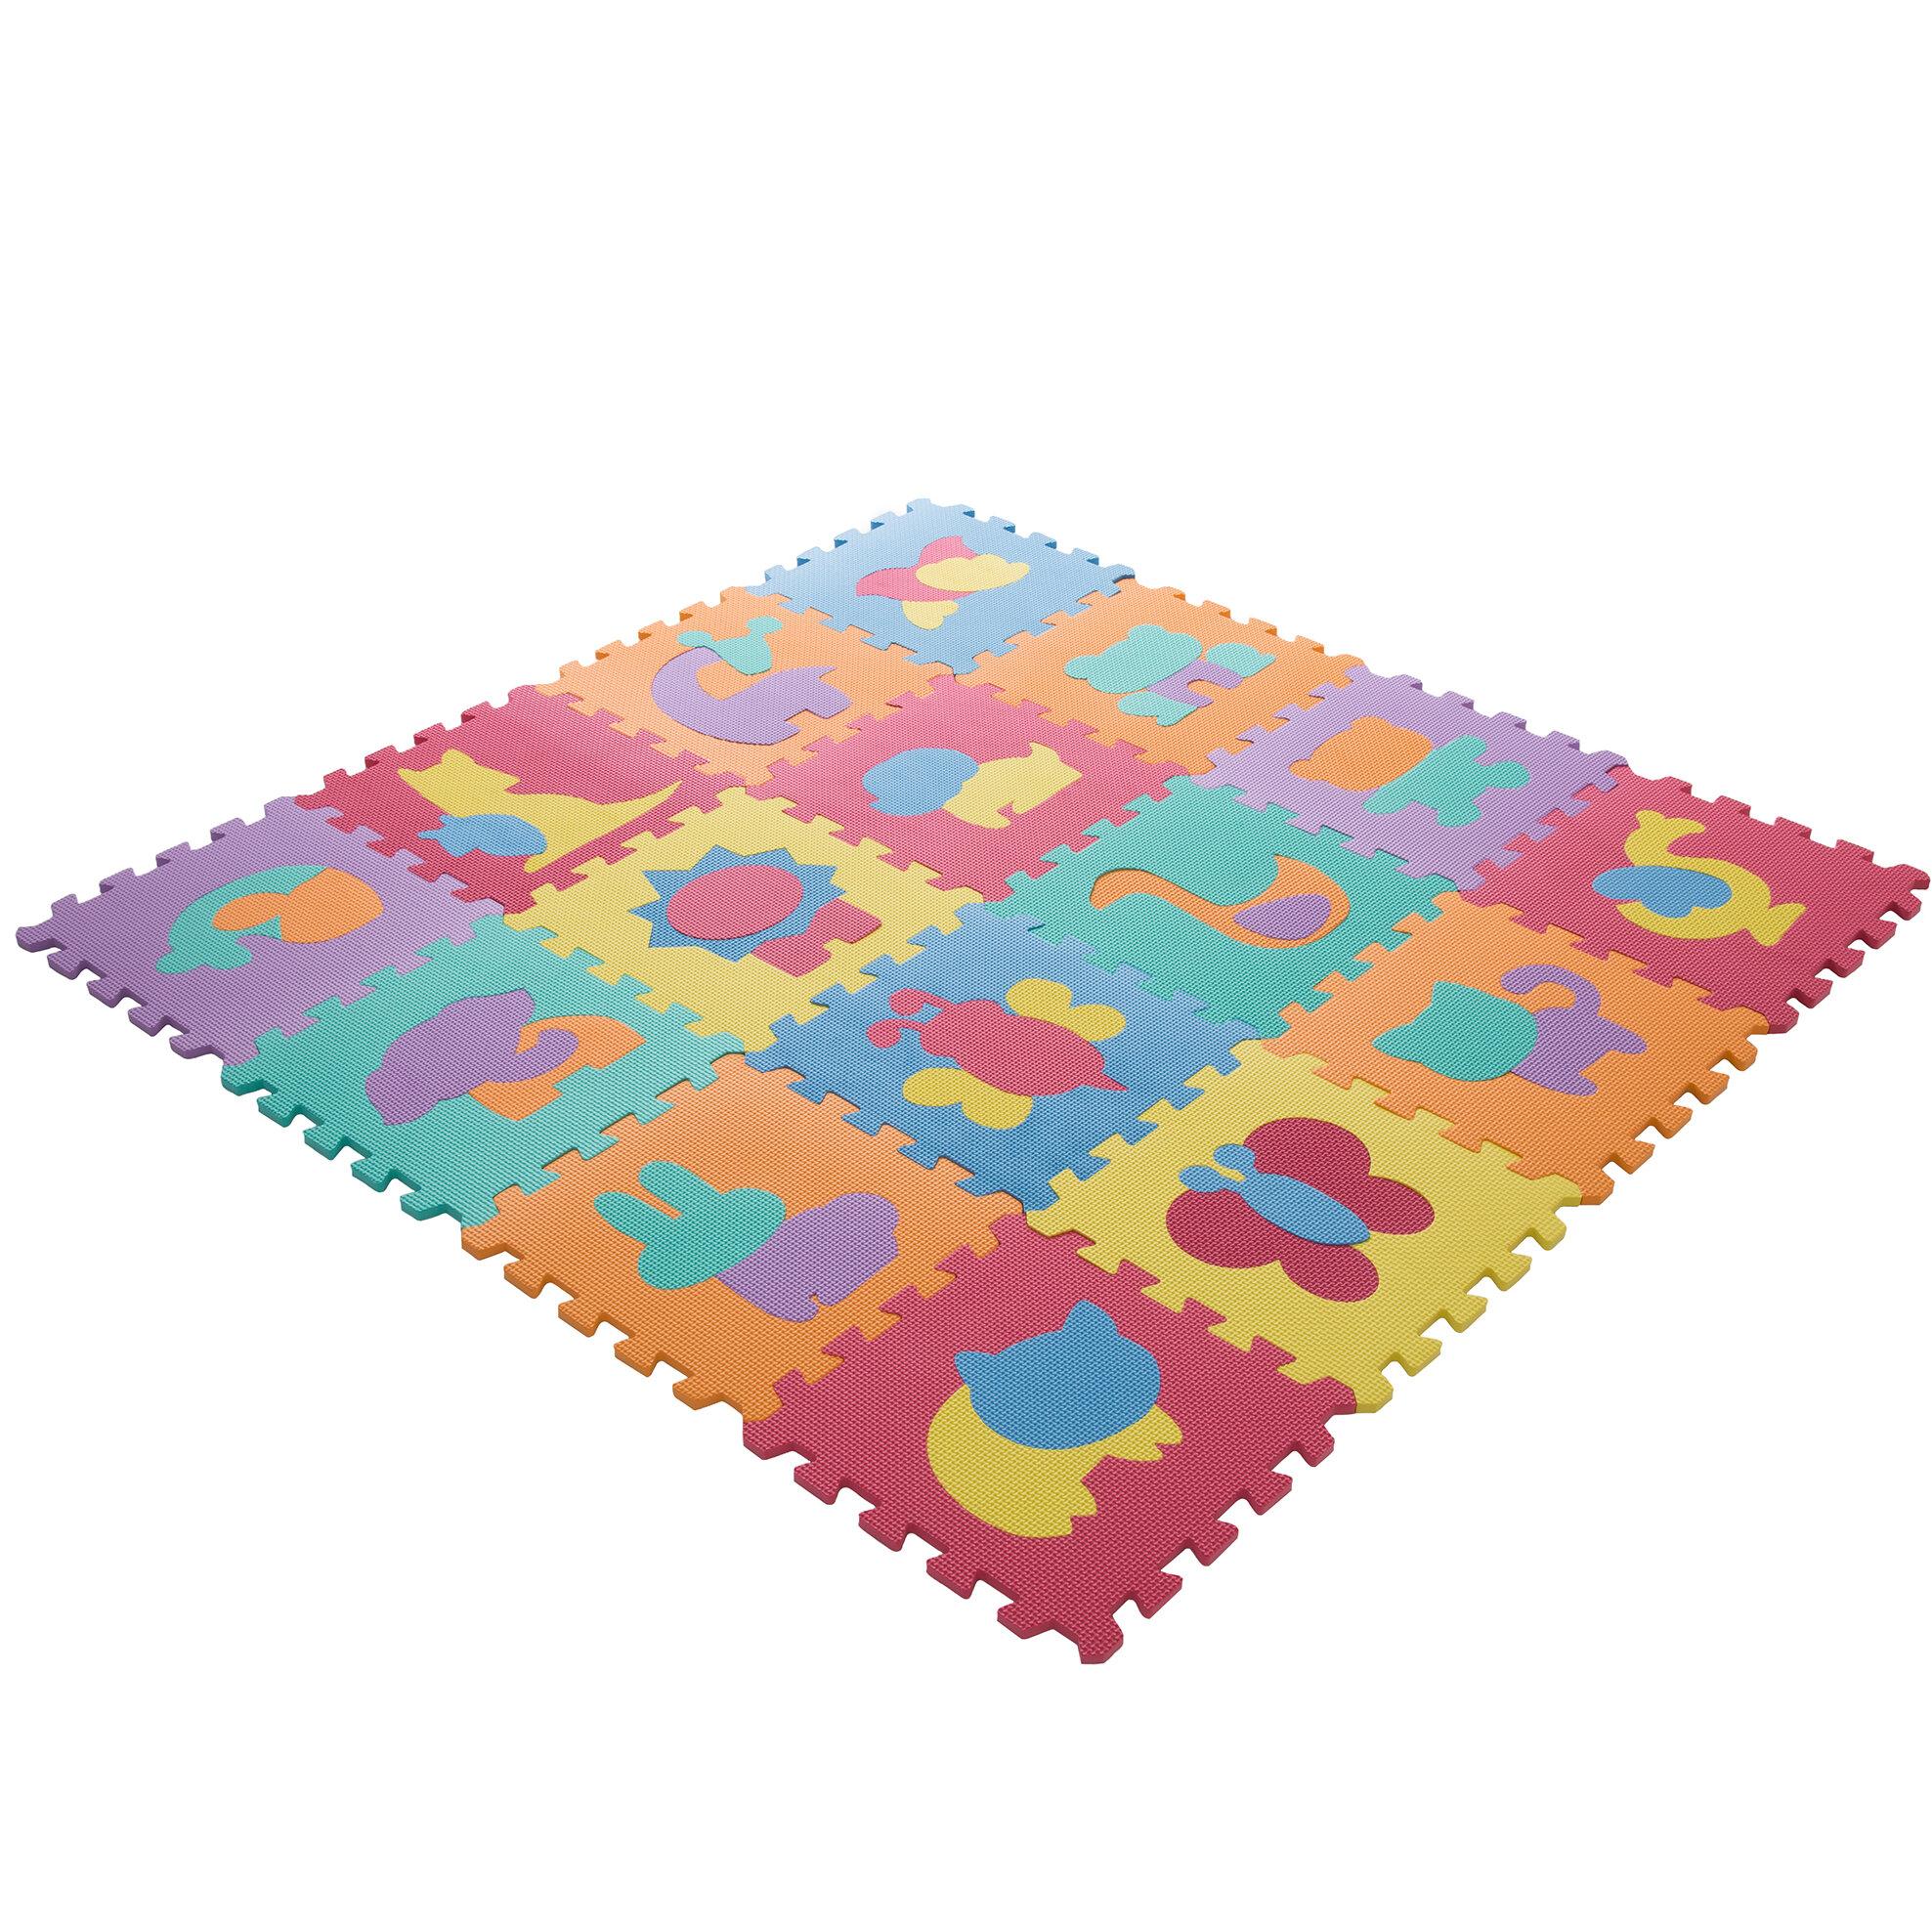 box foam mini giggle entertainment reviews endless s minis puzzle sago mat design mats